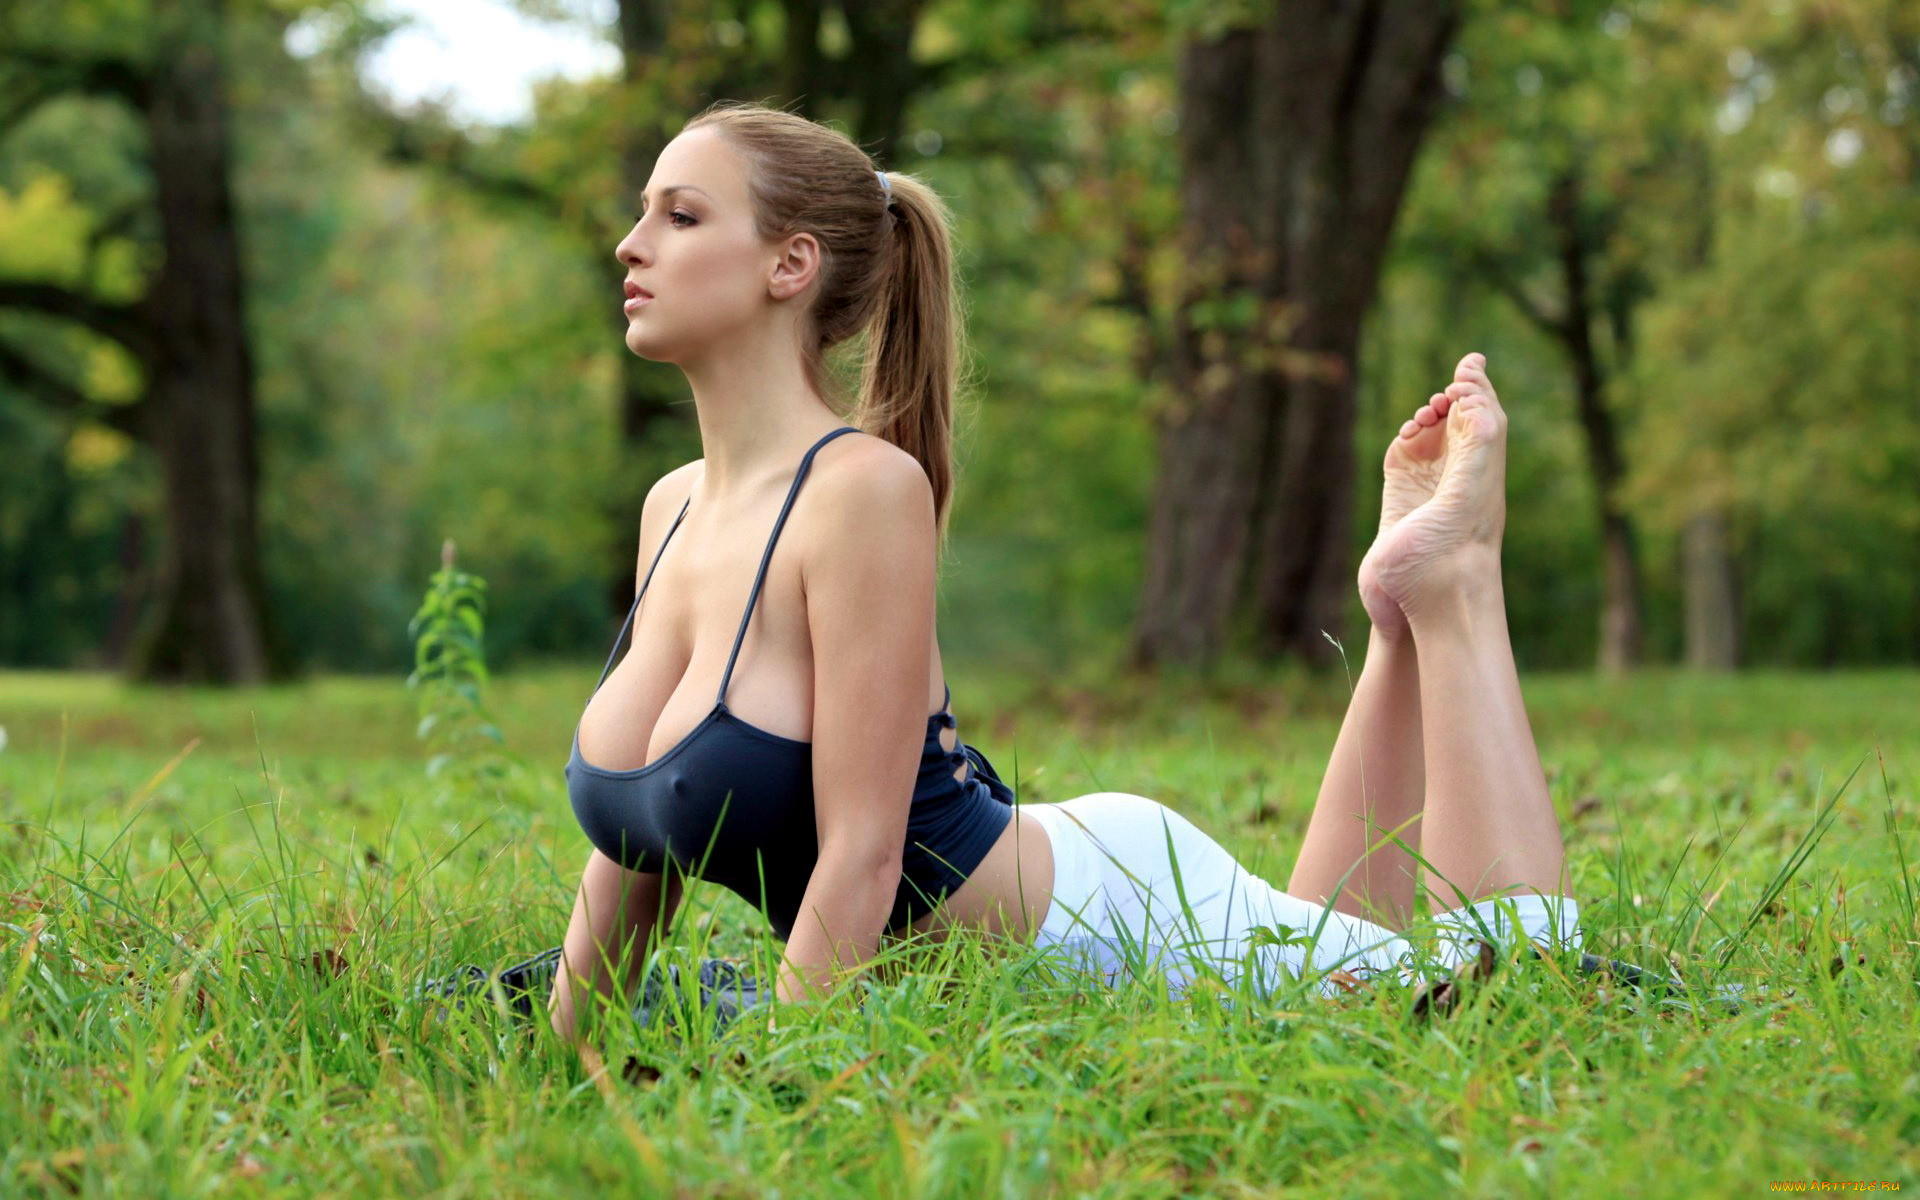 Topless Yoga Girls